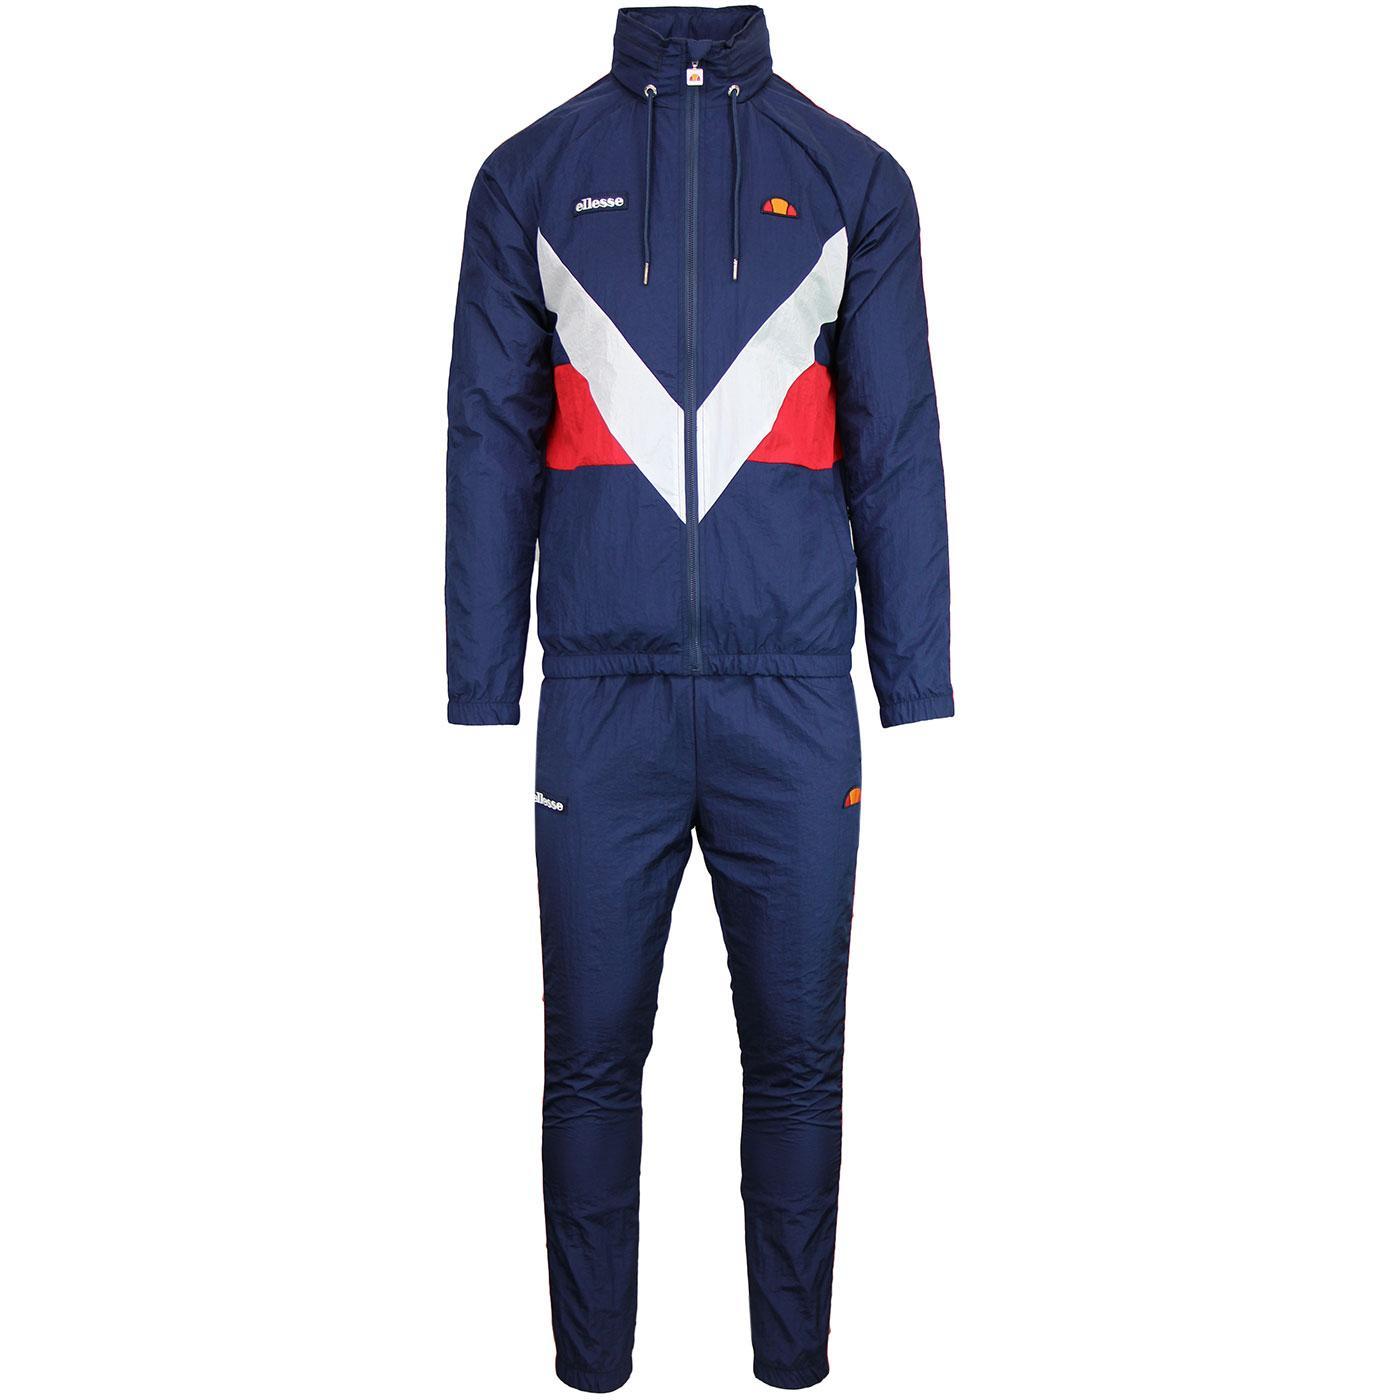 Gerano Avico ELLESSE Retro 80s Shell Suit in Navy